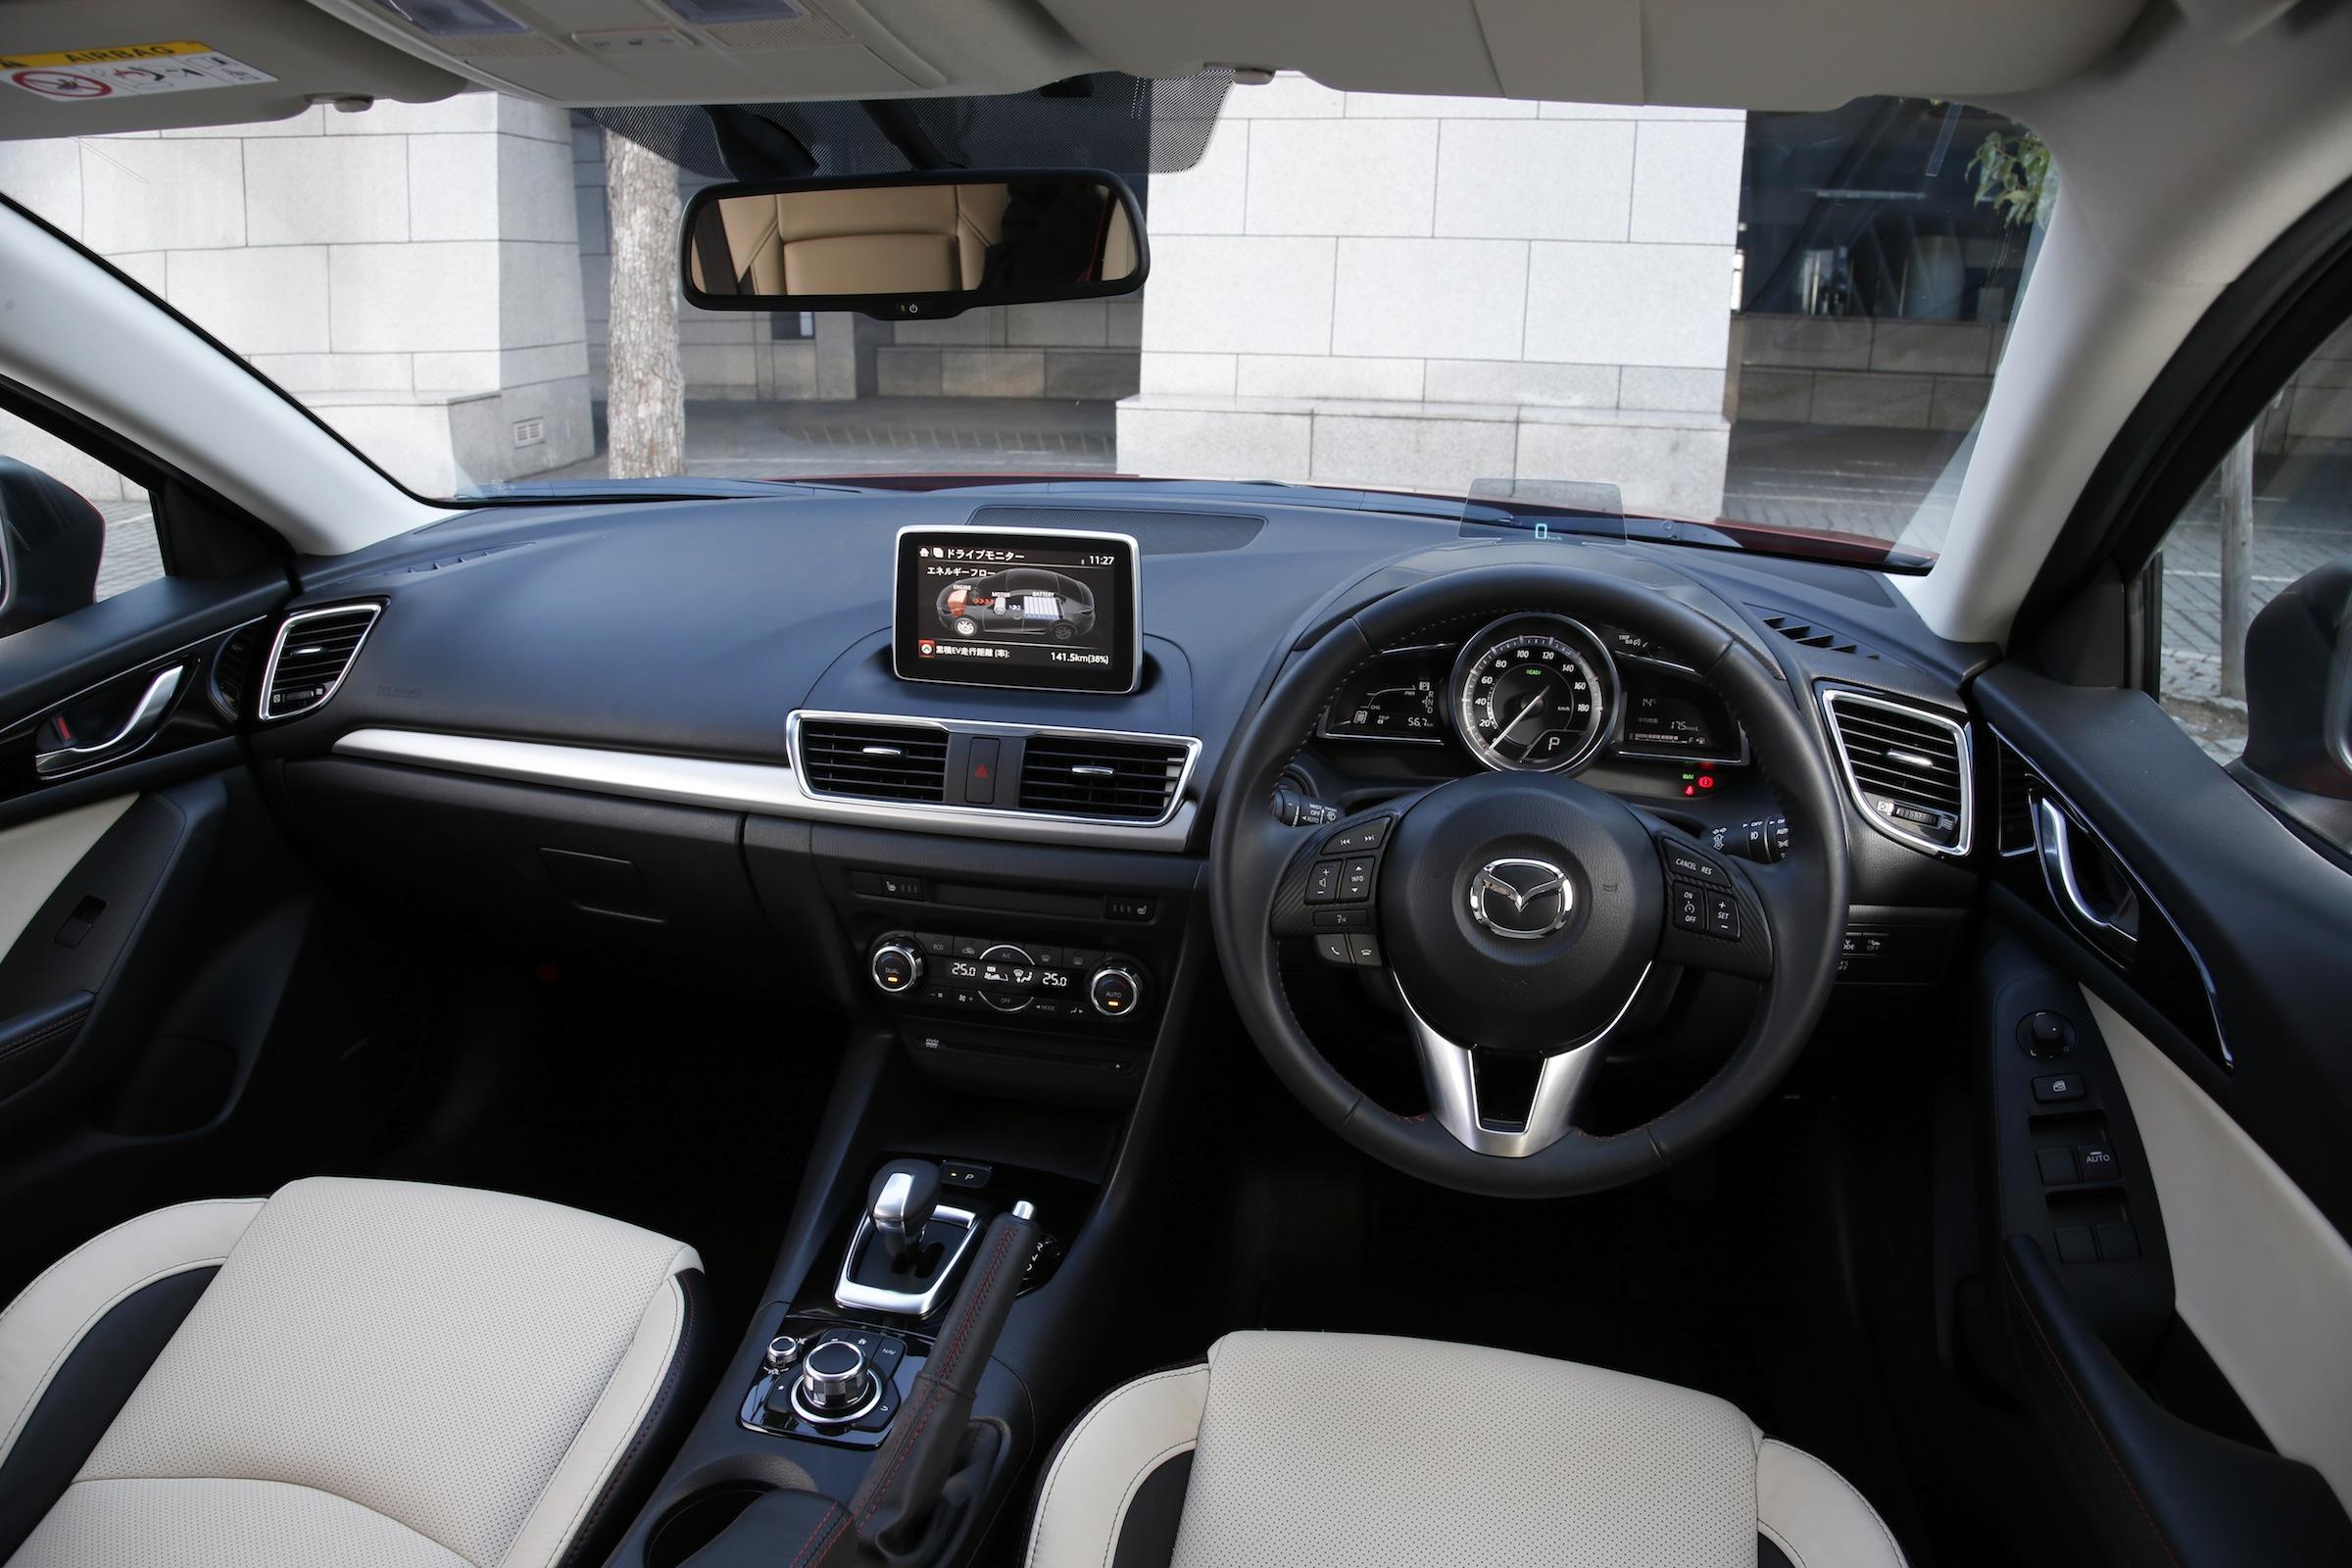 mazda 3 hybrid review quick drive caradvice. Black Bedroom Furniture Sets. Home Design Ideas